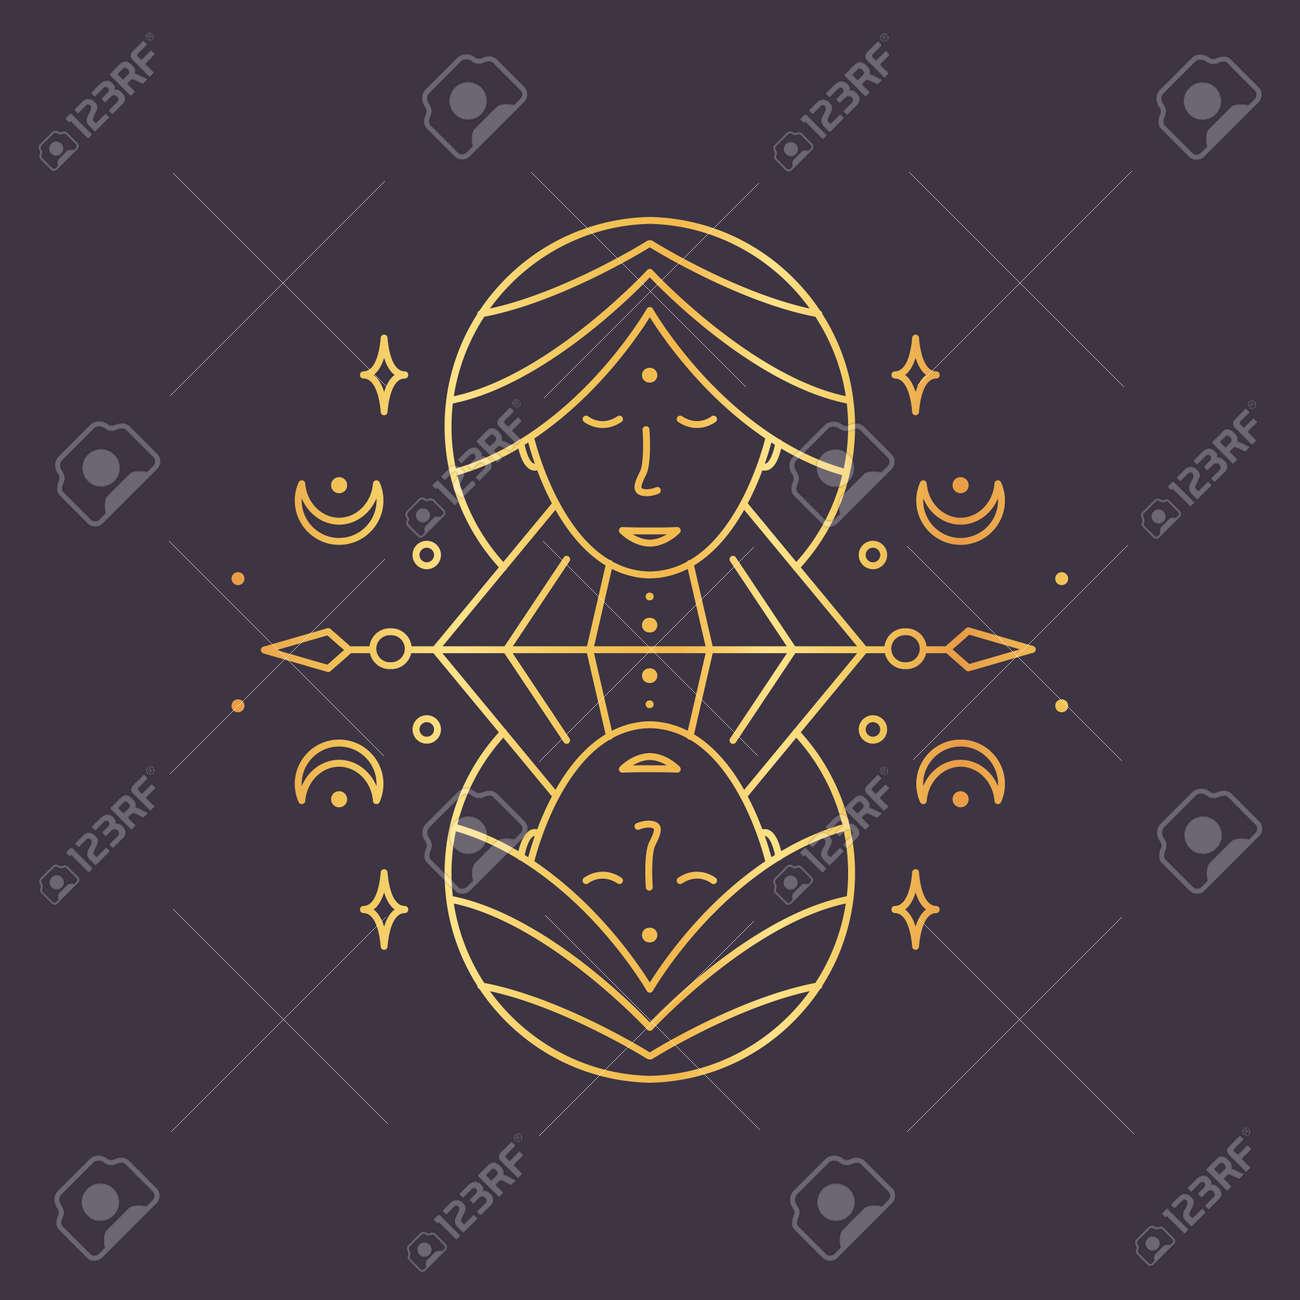 Gemini zodiac sign, horoscope symbol golden. Vector illustration - 135502928